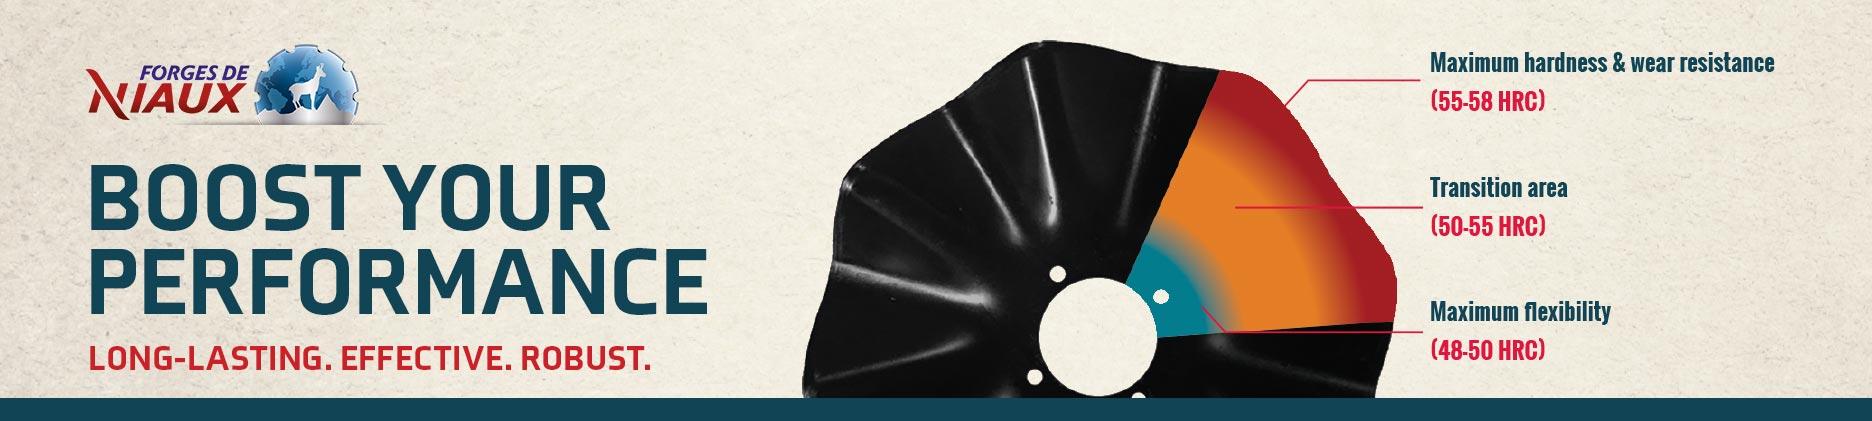 Website_Banner_Inside_Niaux-200-Disks_202006